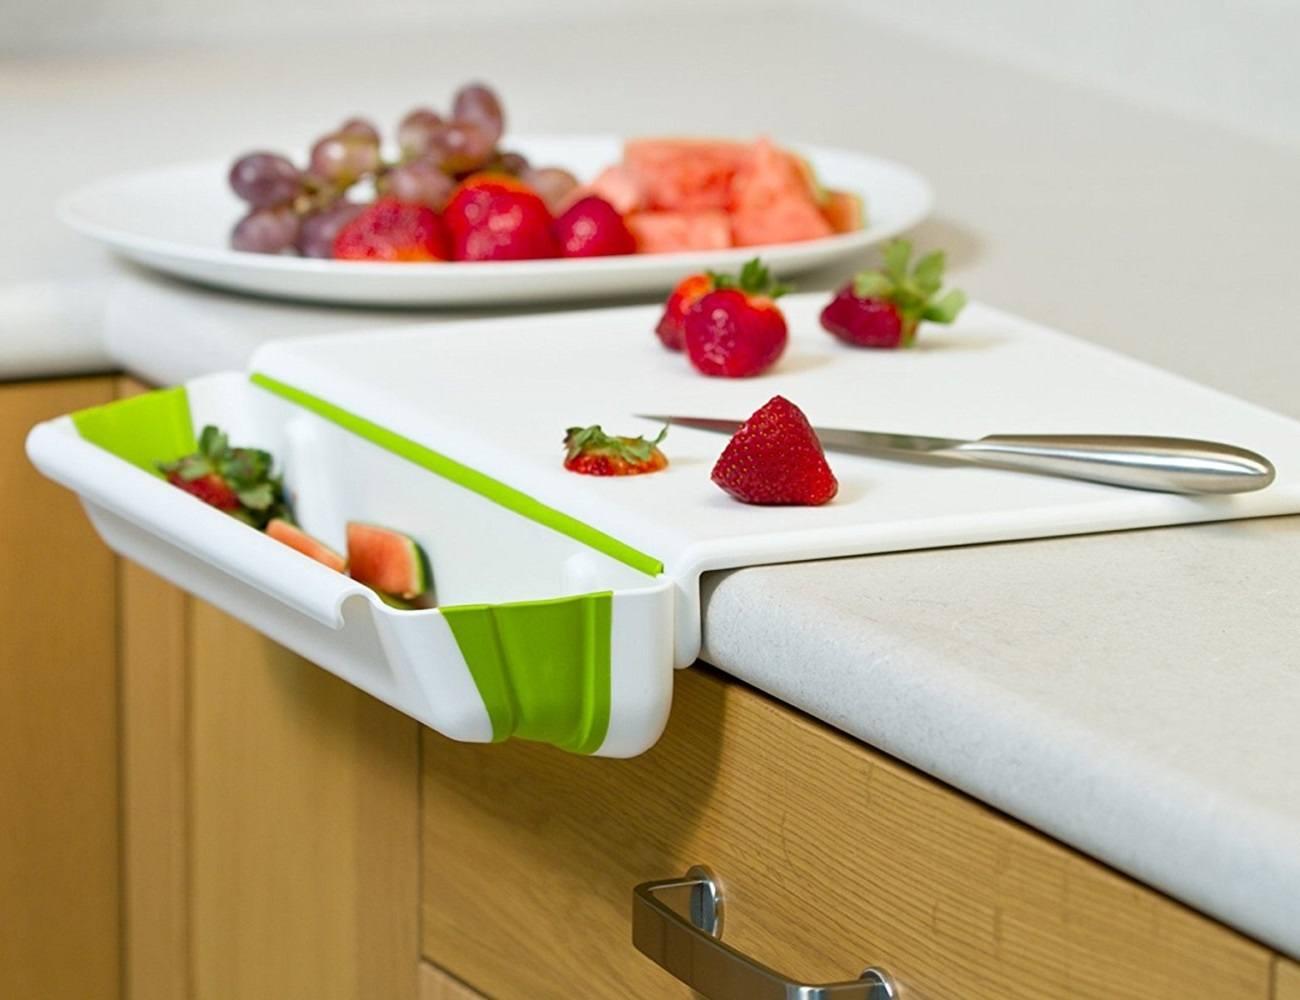 Cutting Board with Collapsible Bin